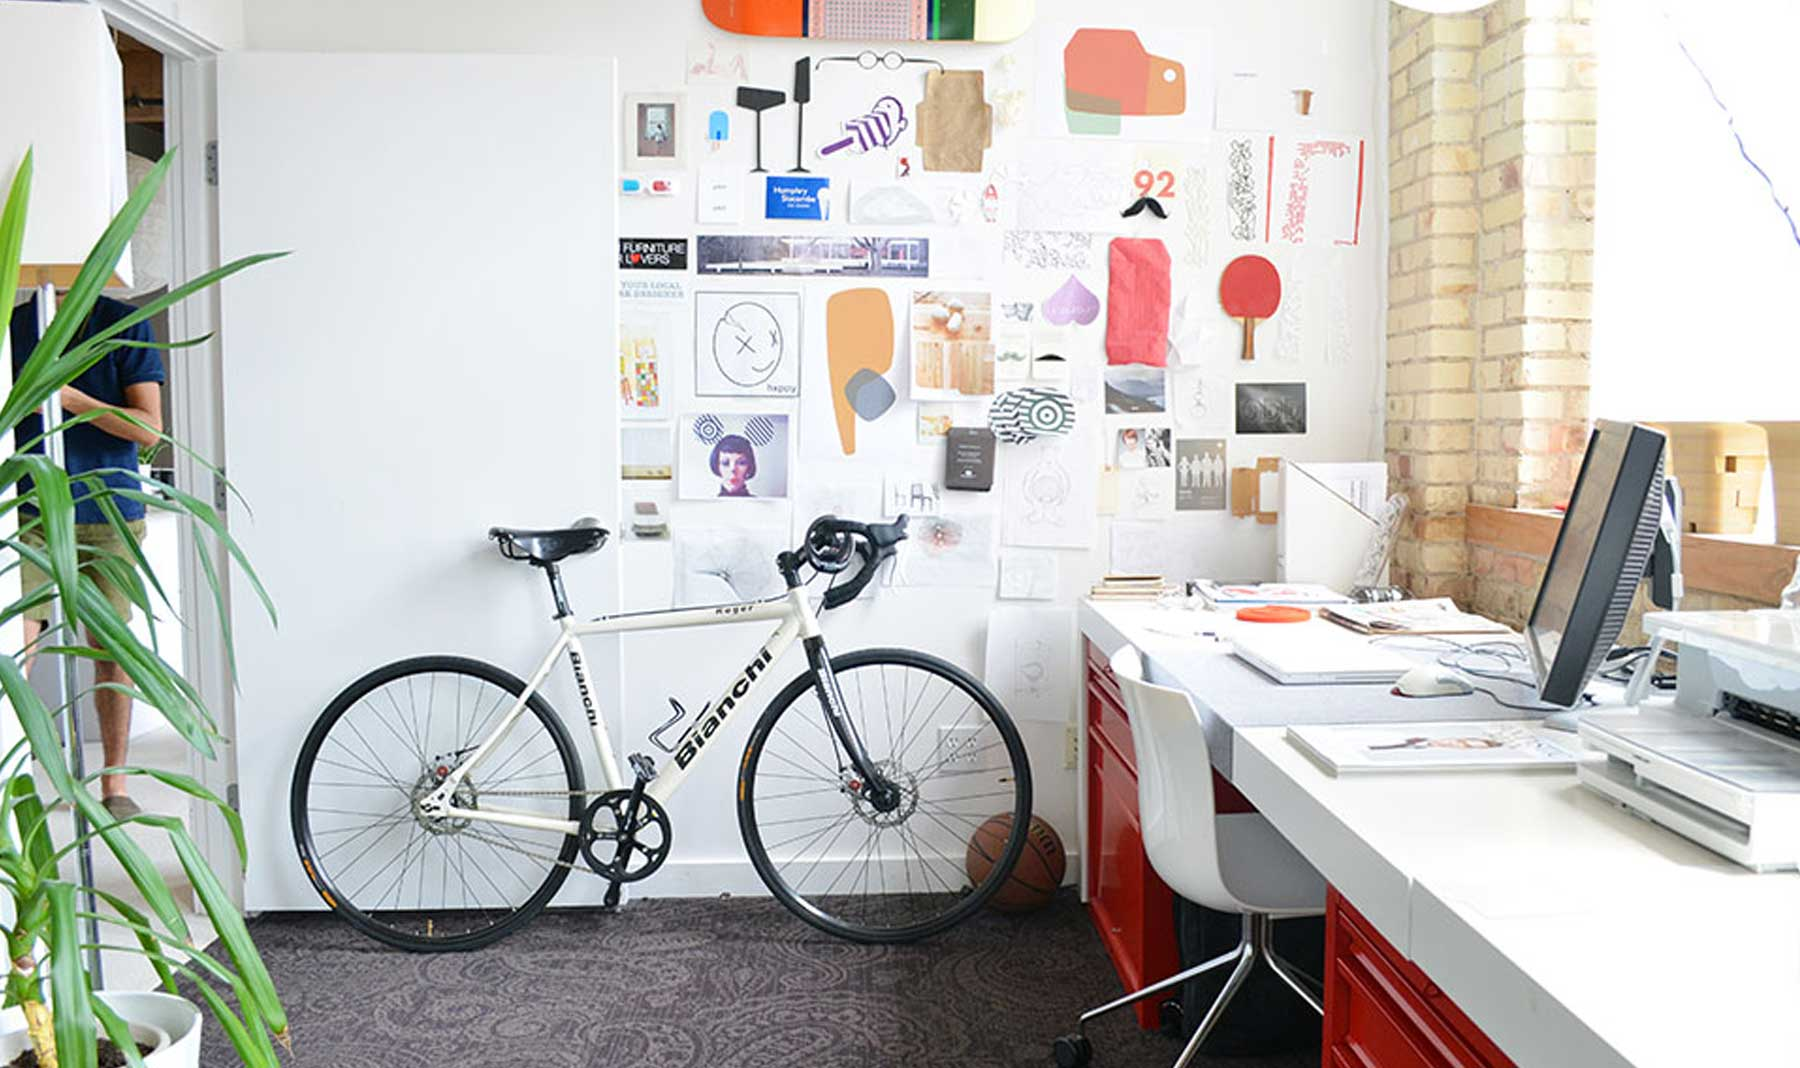 Designer Nicolai Czumaj-Bront's office